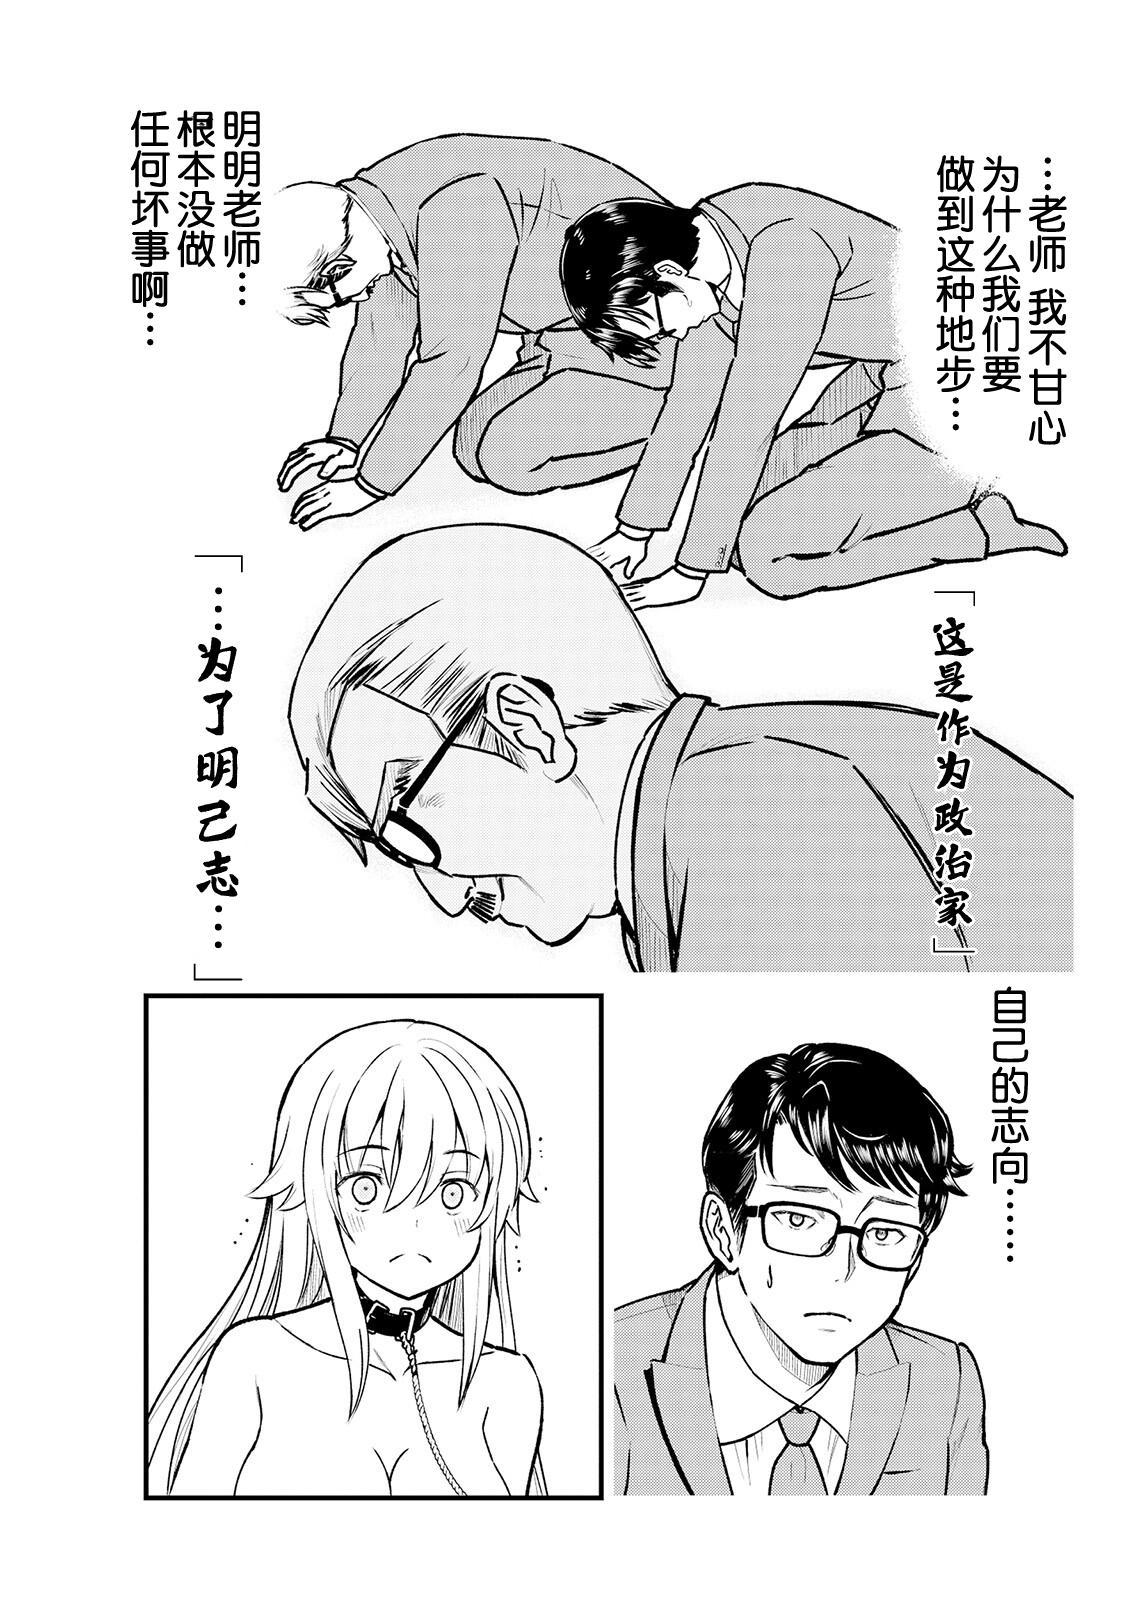 kuxtu koro se no hime kisi to nari, yuri syoukan de hatara ku koto ni nari masi ta. 3 (chinese)(鬼畜王汉化组) 13